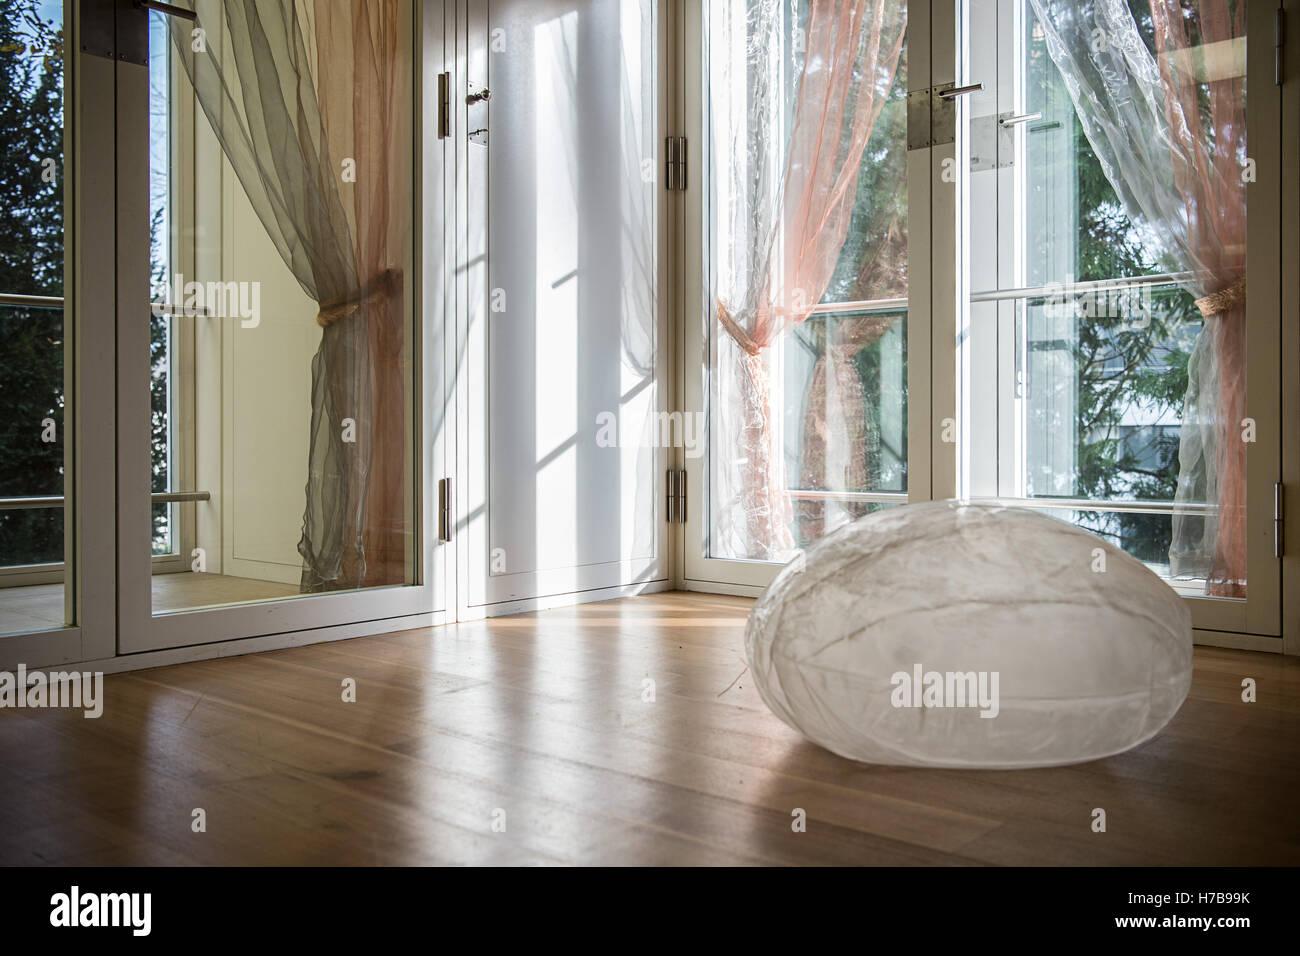 Nett Installation In Häusern Ideen - Schaltplan Serie Circuit ...